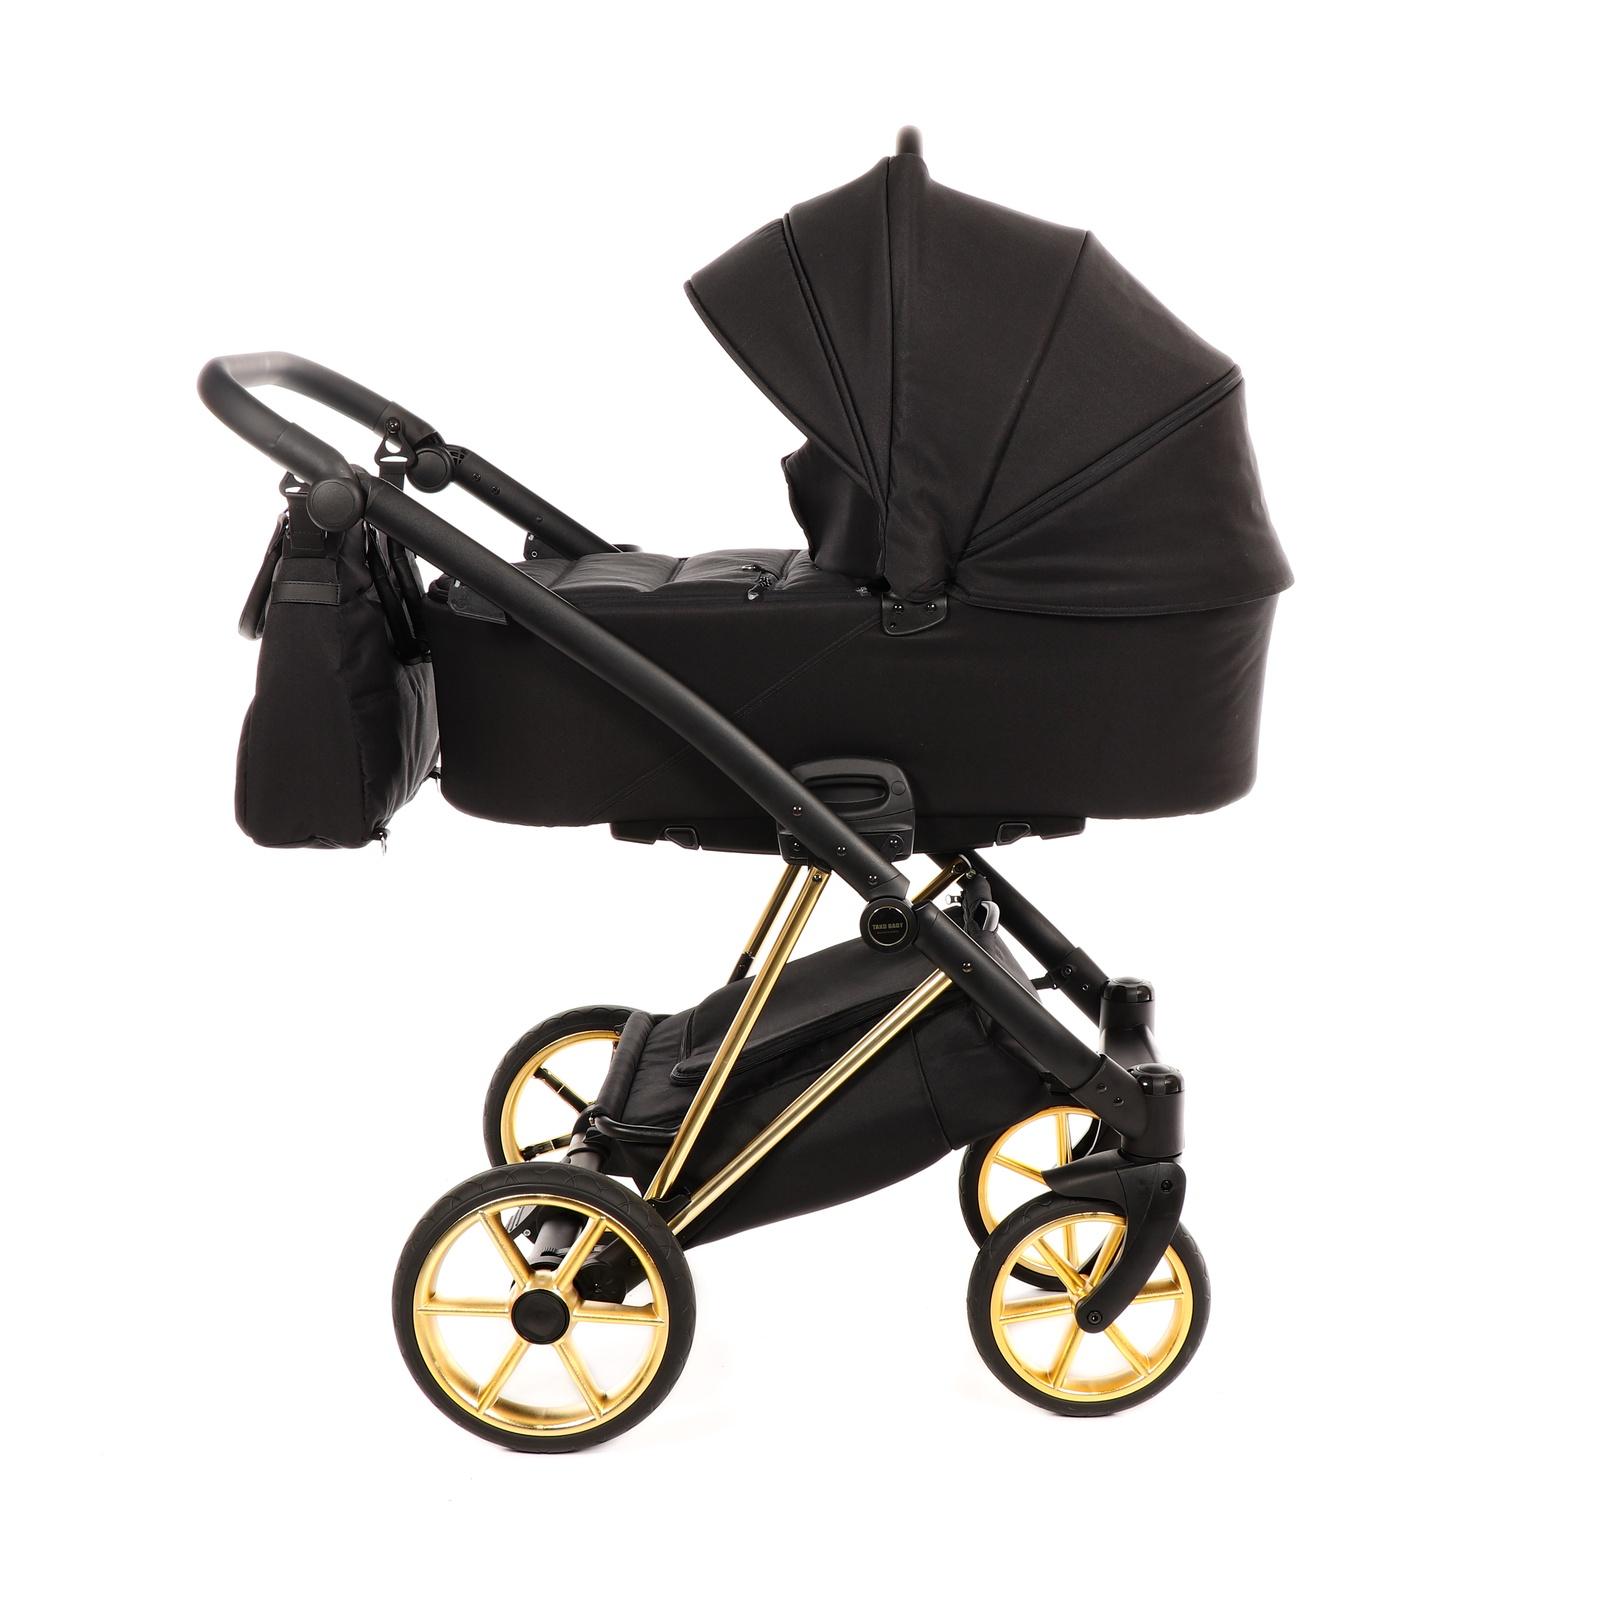 TAKO JUMPER STYLE (JUMPER-V) TJS-05 Коляска детская 2 в 1 (черный/рама золото) коляска 2 в 1 tako jumper style jumper v светло серый черный рама серебро tjs 02